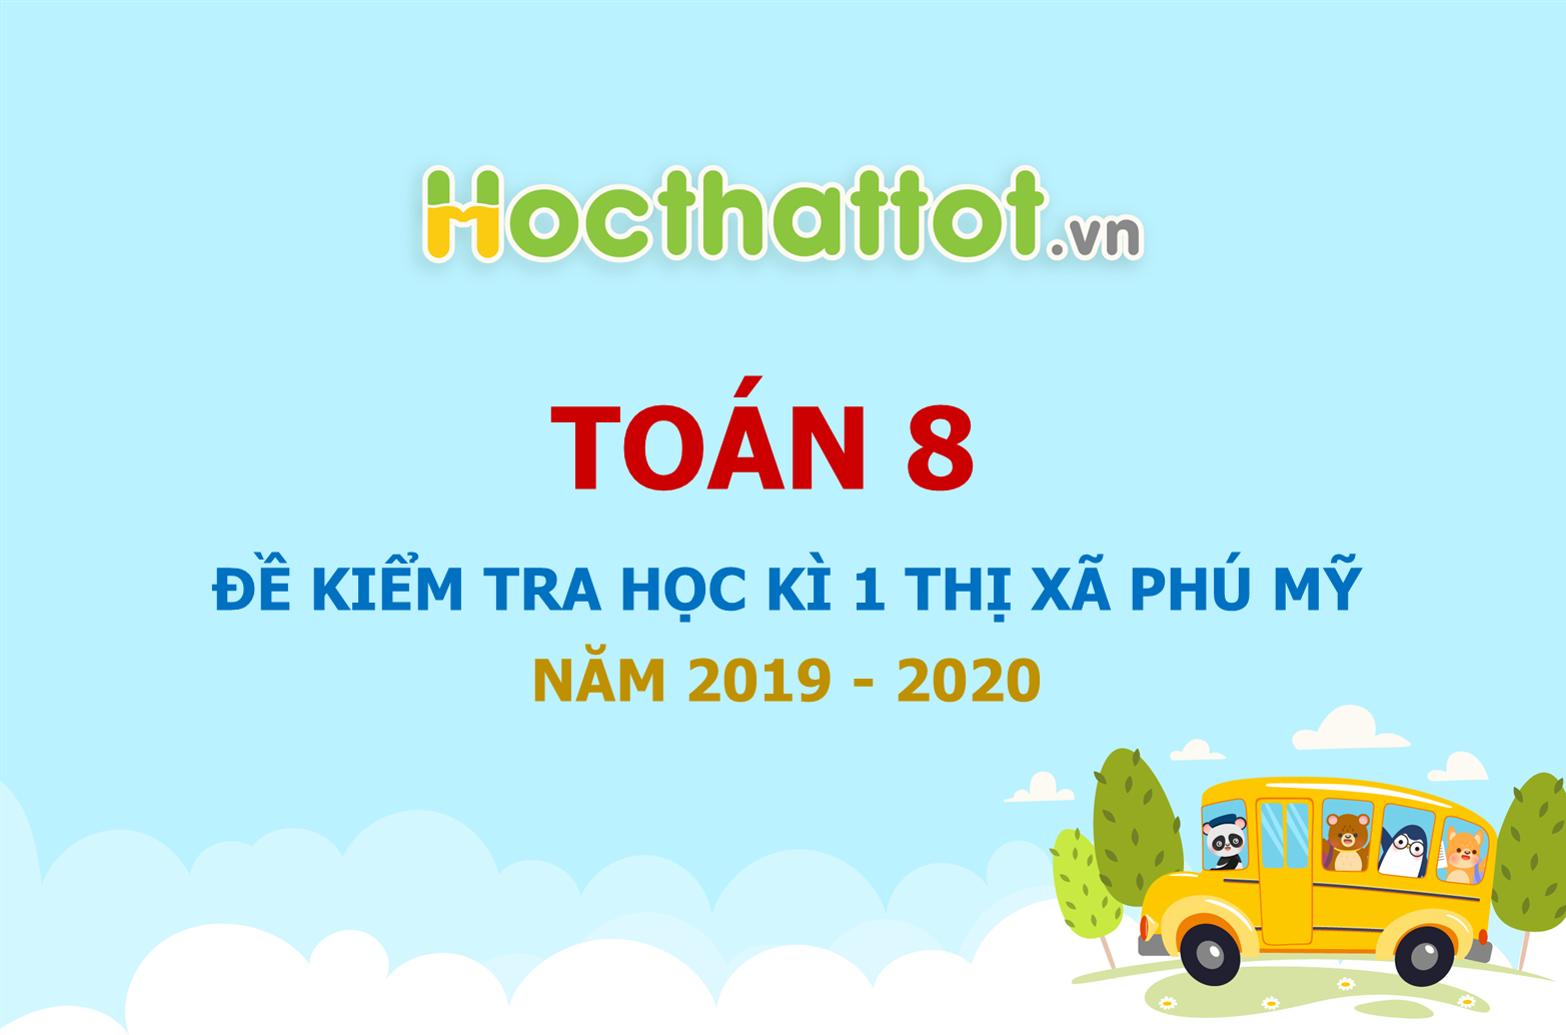 de-thi-hoc-ki-1-toan-8-nam-2019-2020-phong-gddt-phu-my